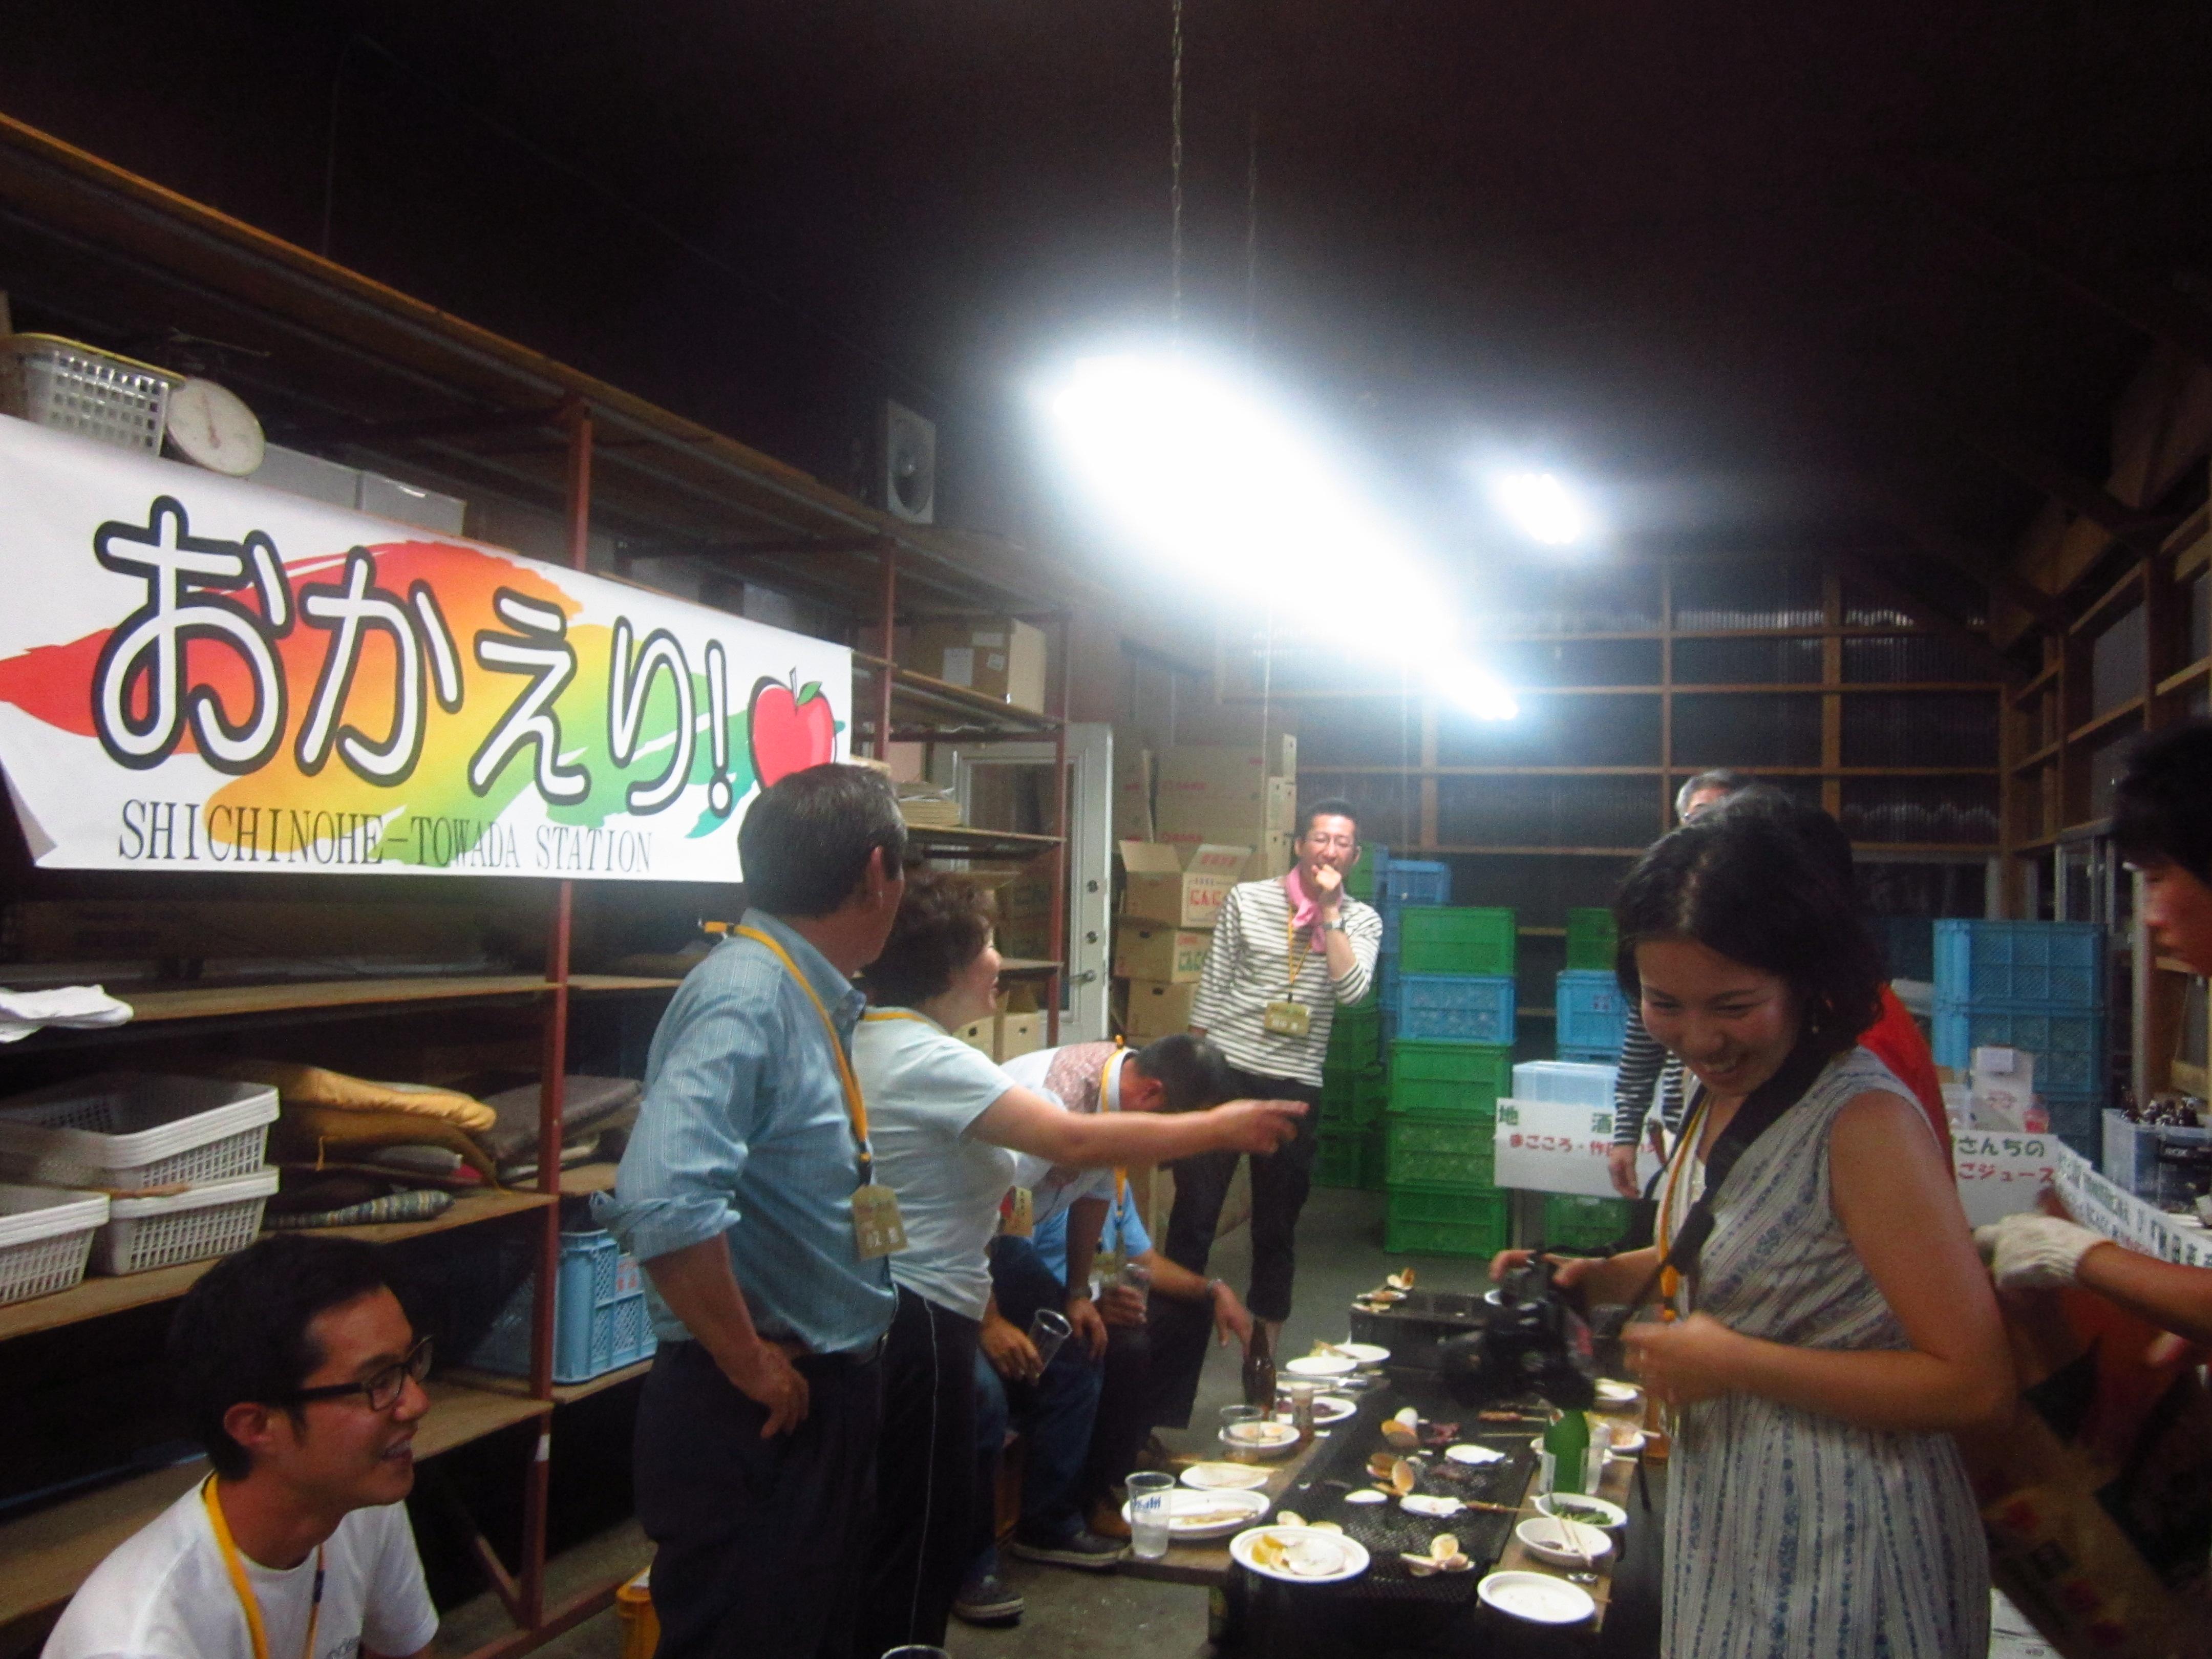 IMG 4448 - 麻布十番納涼祭り25,26日(七戸町出店)